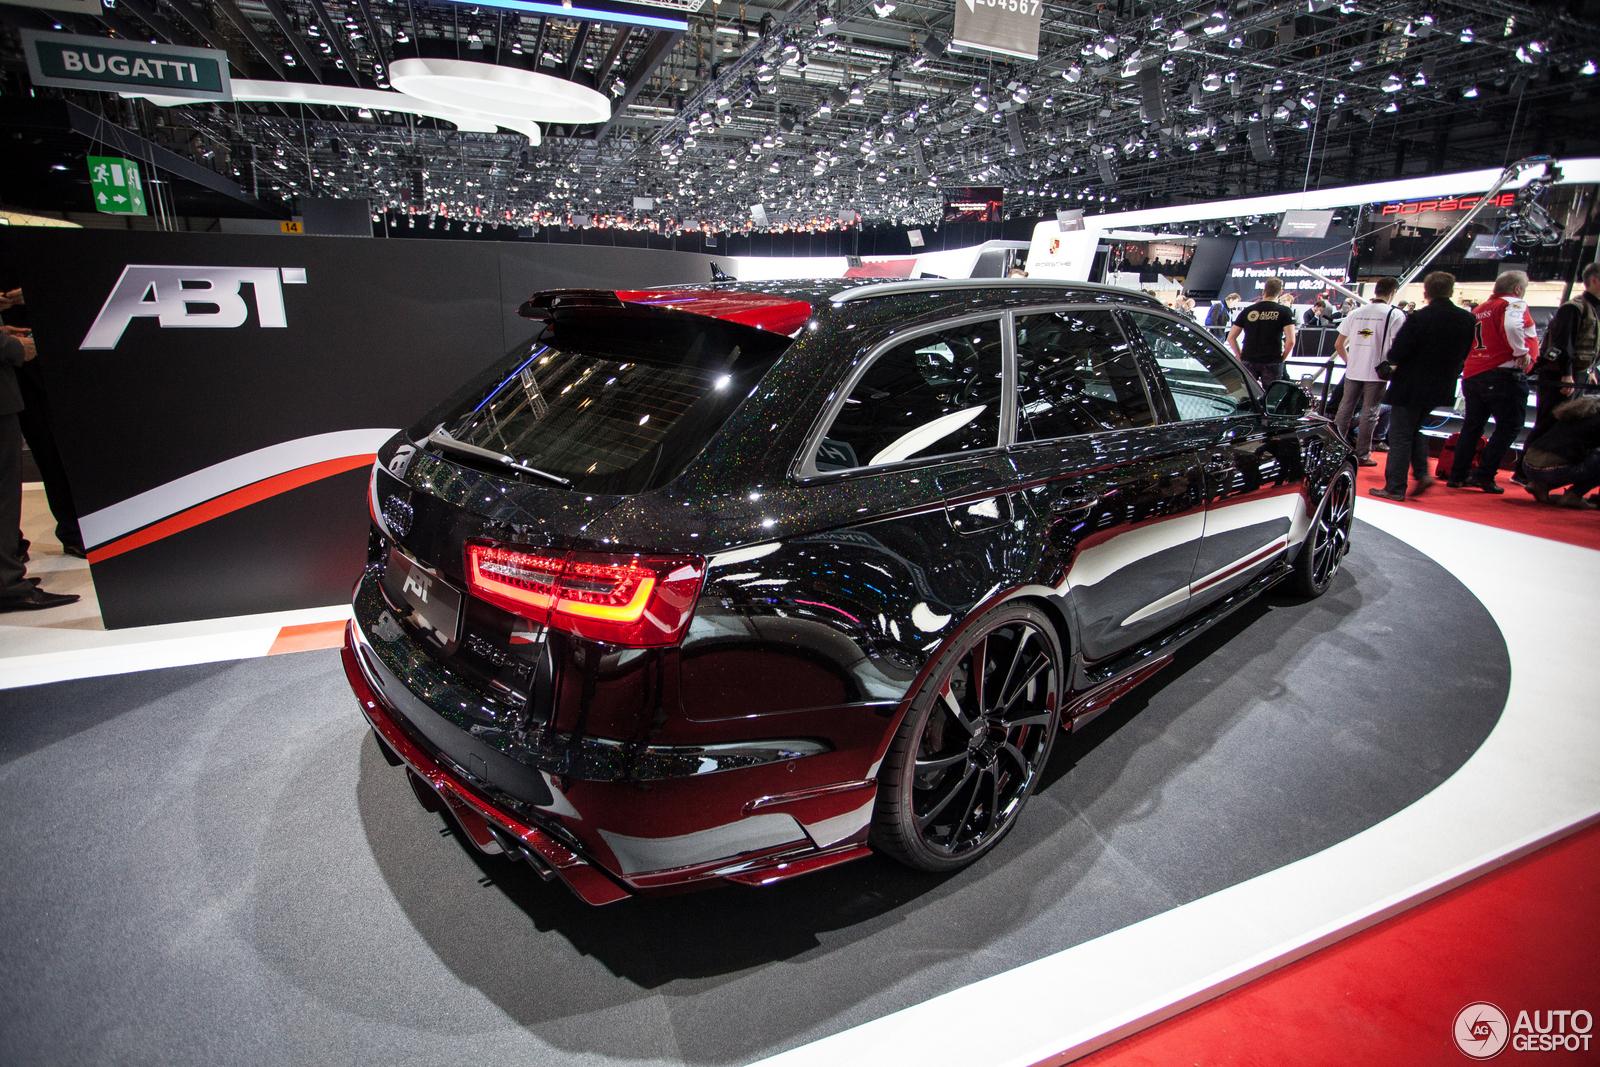 Audi Rs7 2014 For Sale >> Geneva 2014: Audi ABT RS6-R